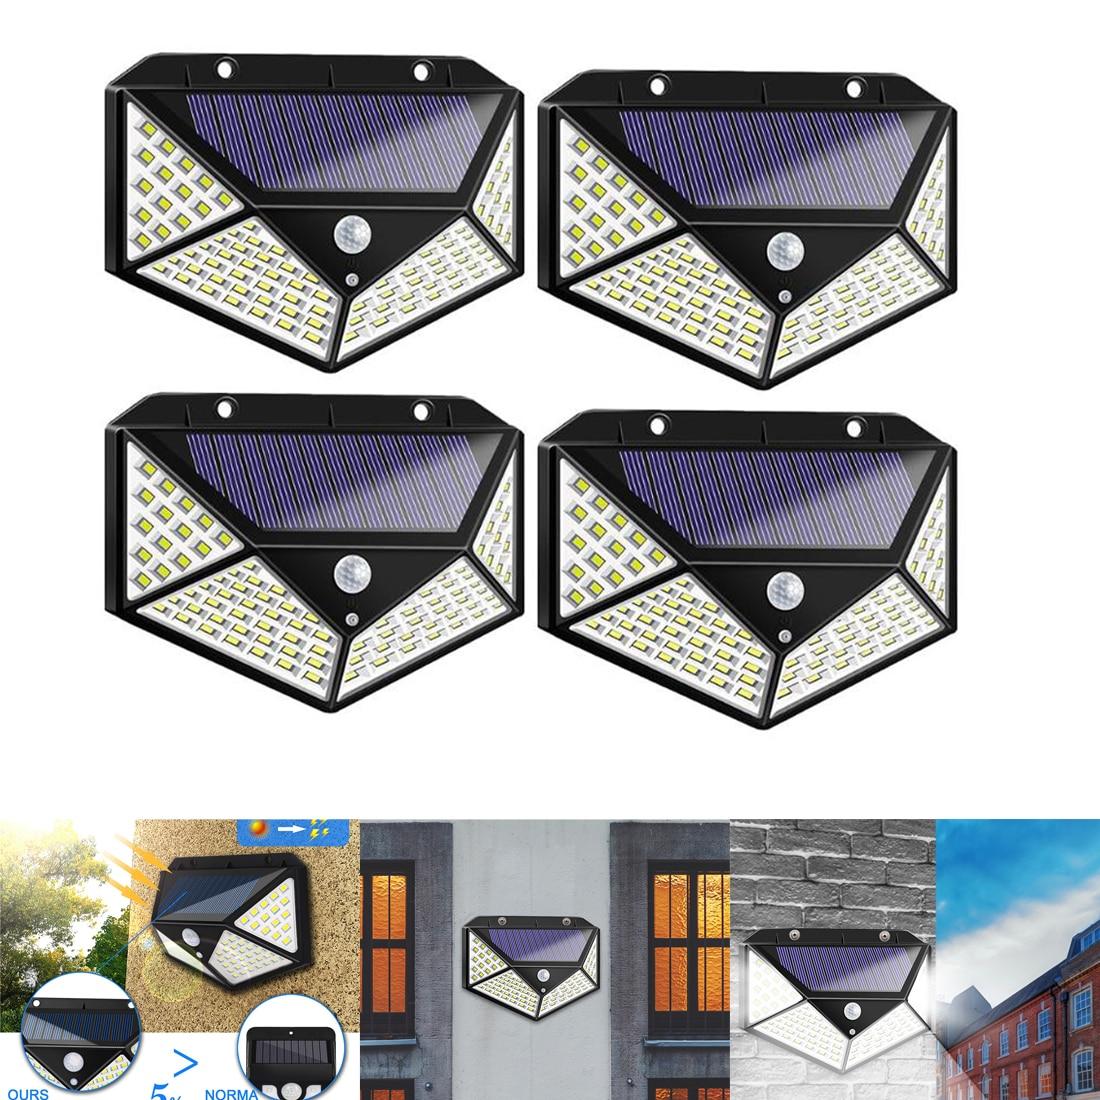 100/144 LED Solar Power Light 3 Modes 120 Degree Motion Sensor Angle Wall Lamp Waterproof Outdoor Yard Garden Lamps